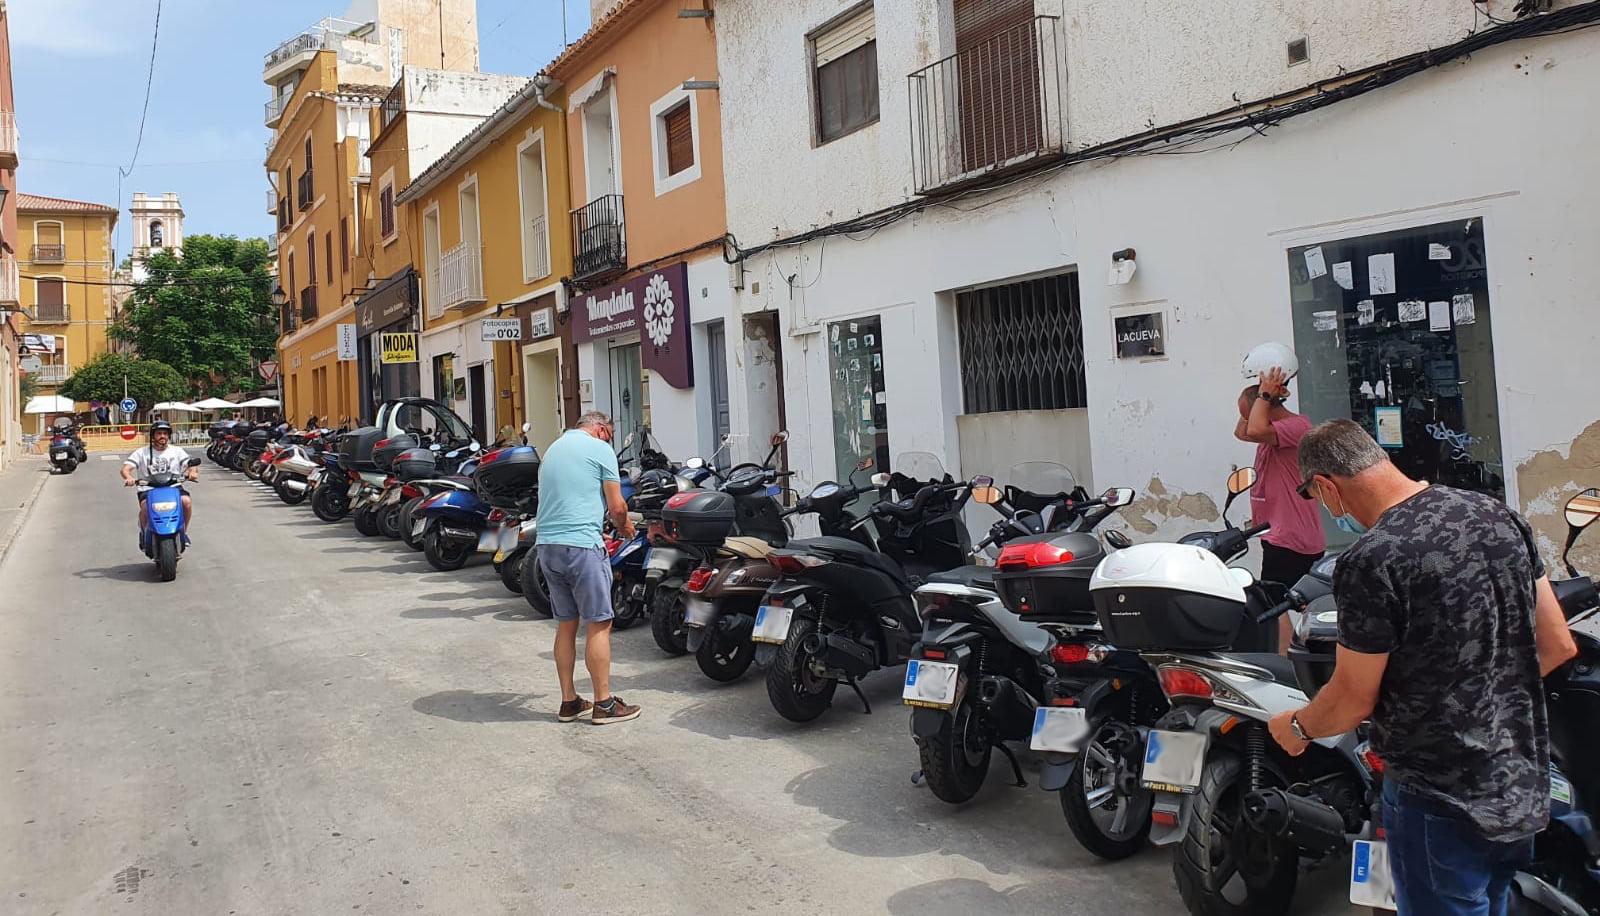 Full motorcycle parking next to the Glorieta